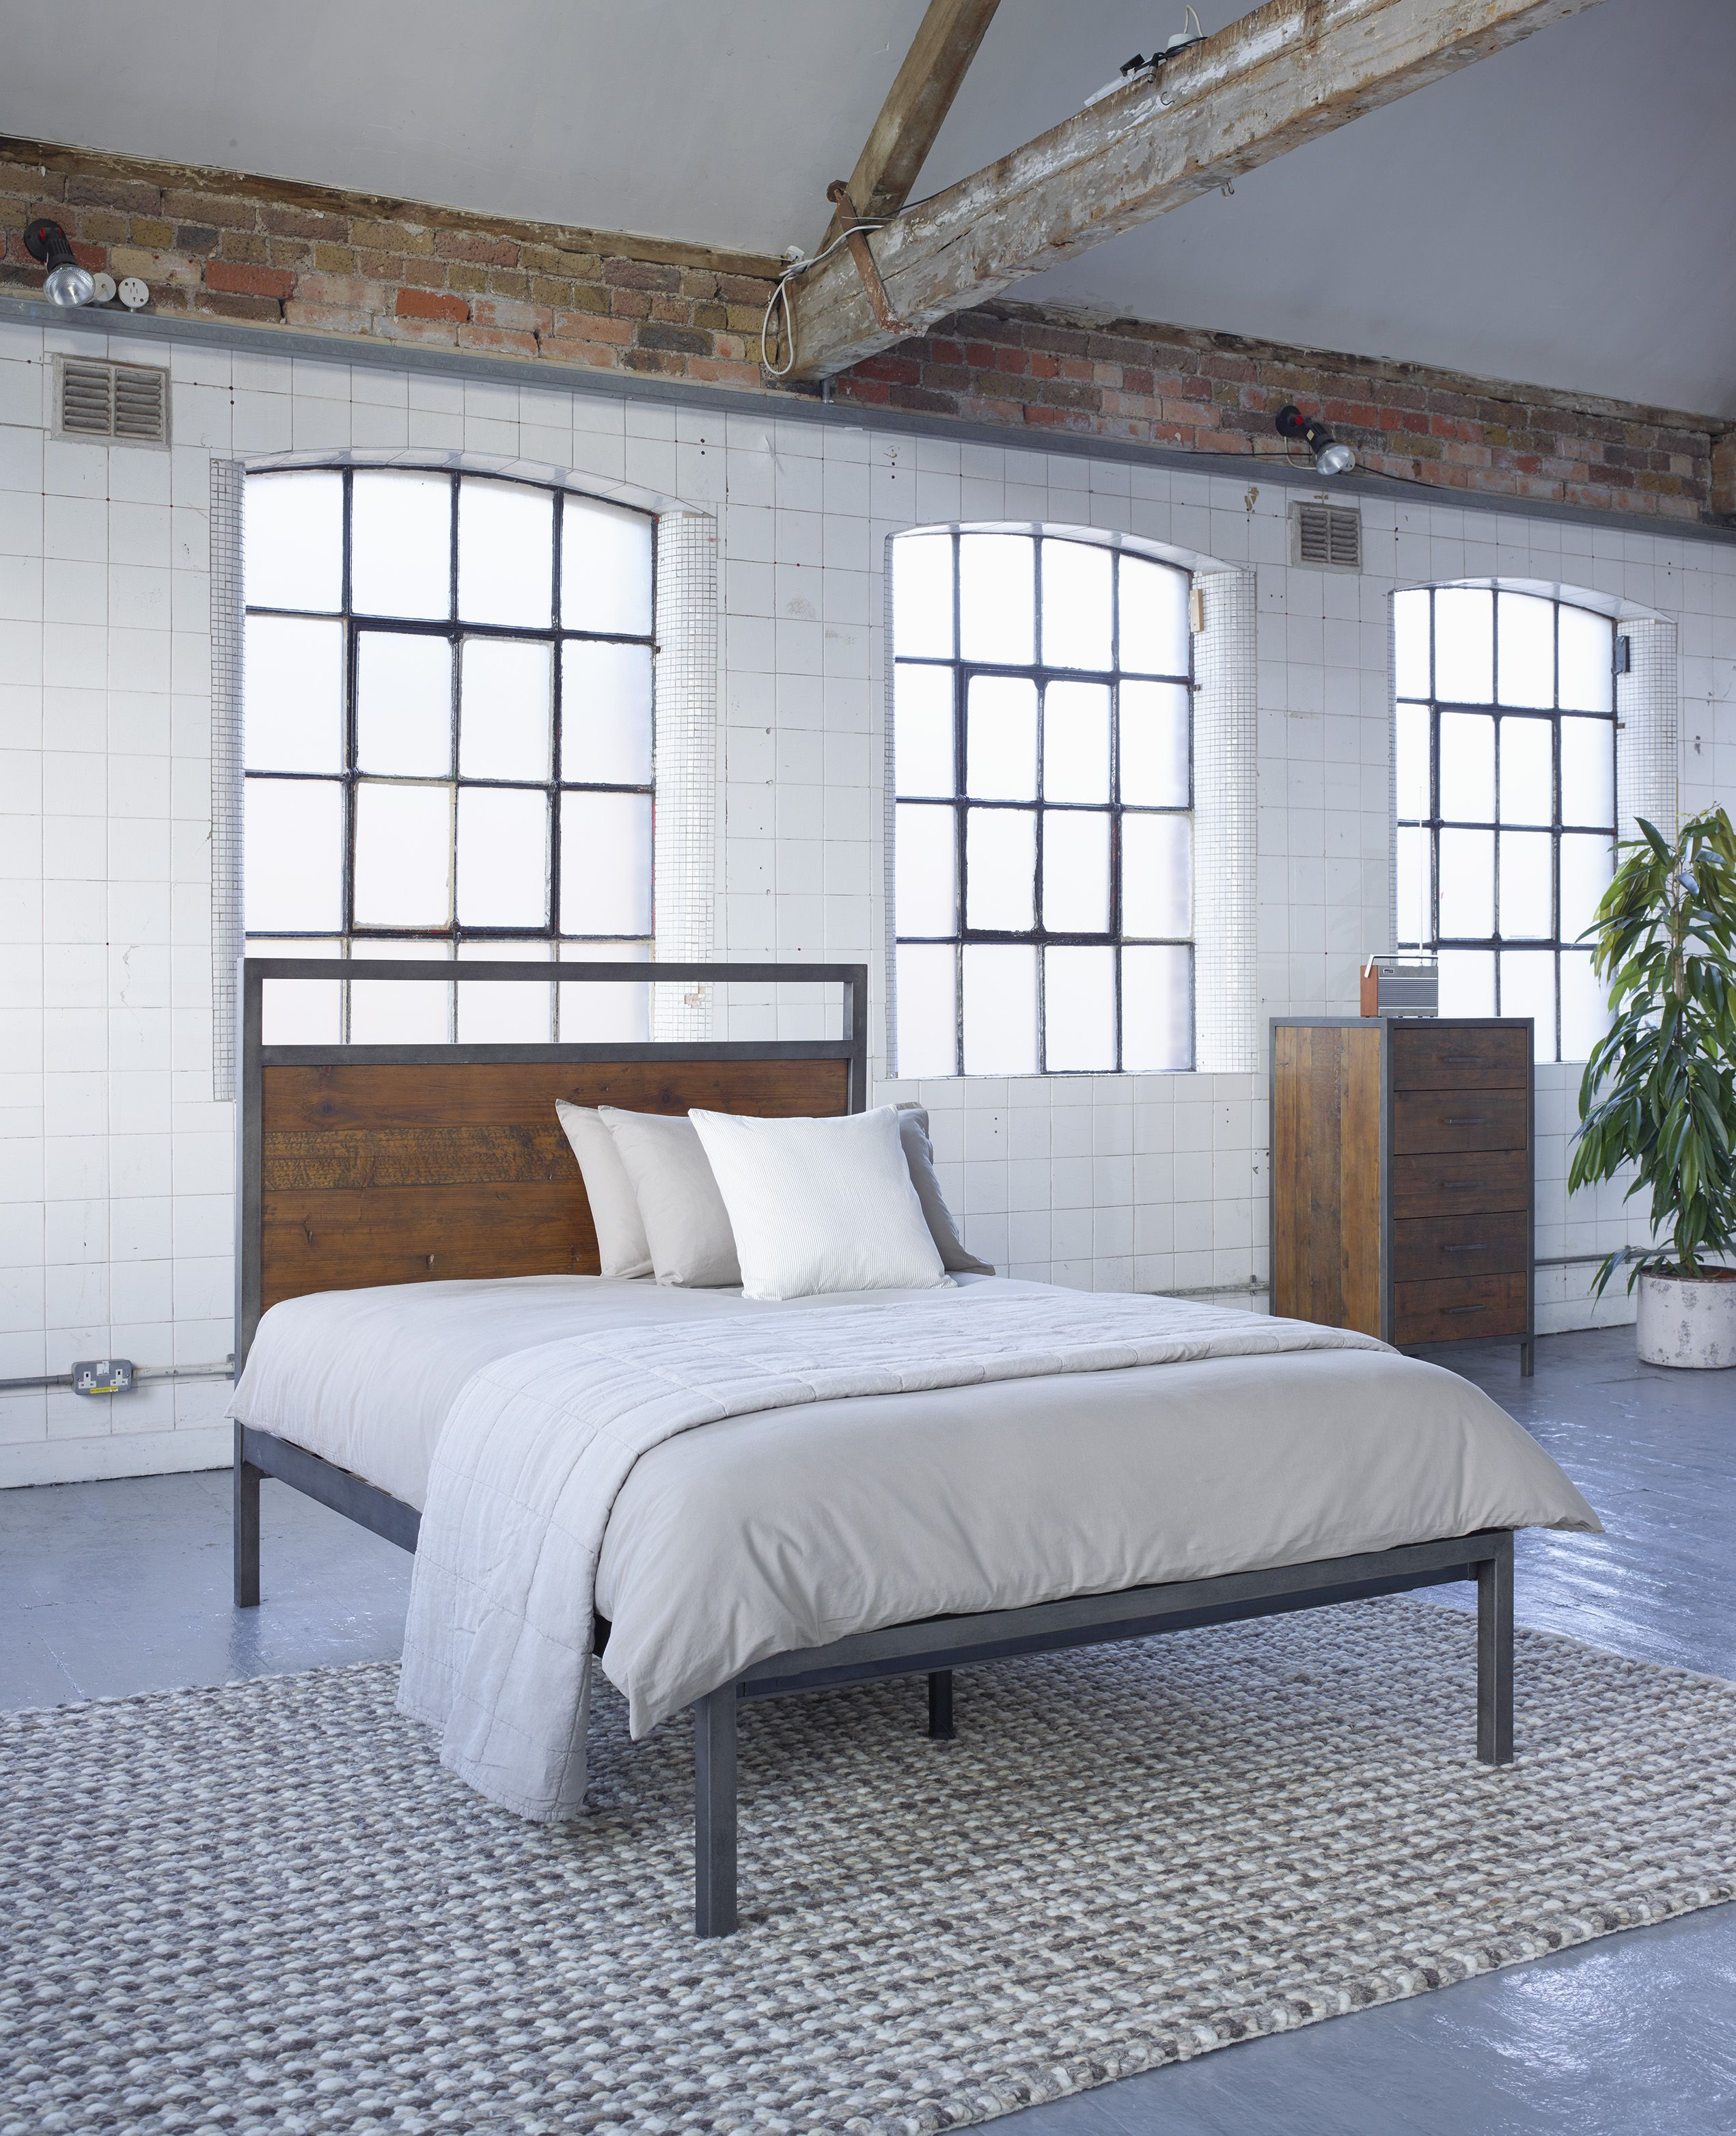 Cheap Vintage Style Bedroom Furniture. vintage style ...